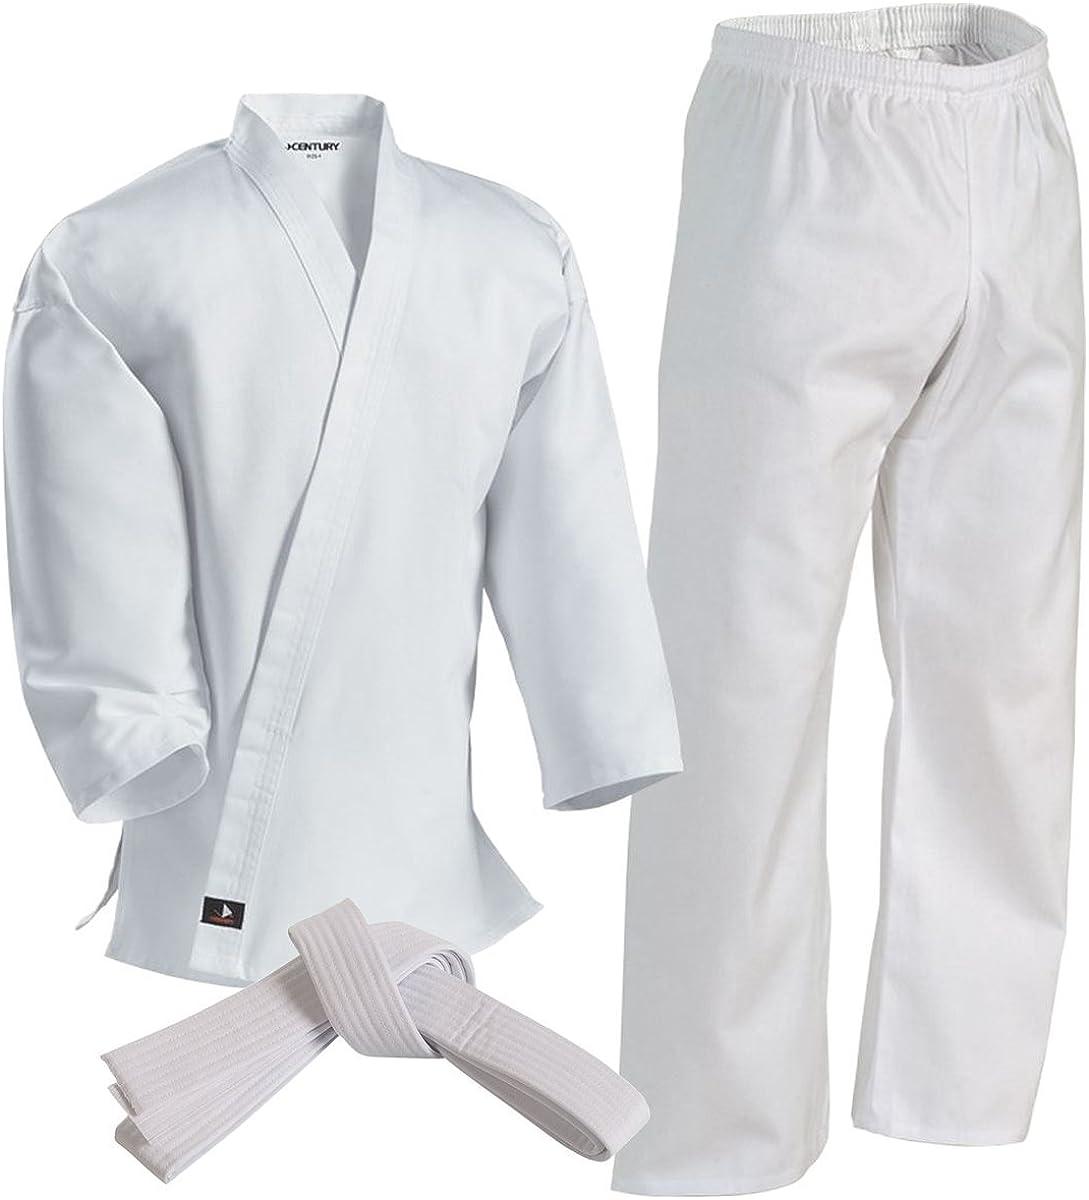 Martial Arts Lightweight Karate Uniform For Kids /& Adult with Free Belt 6.5 oz